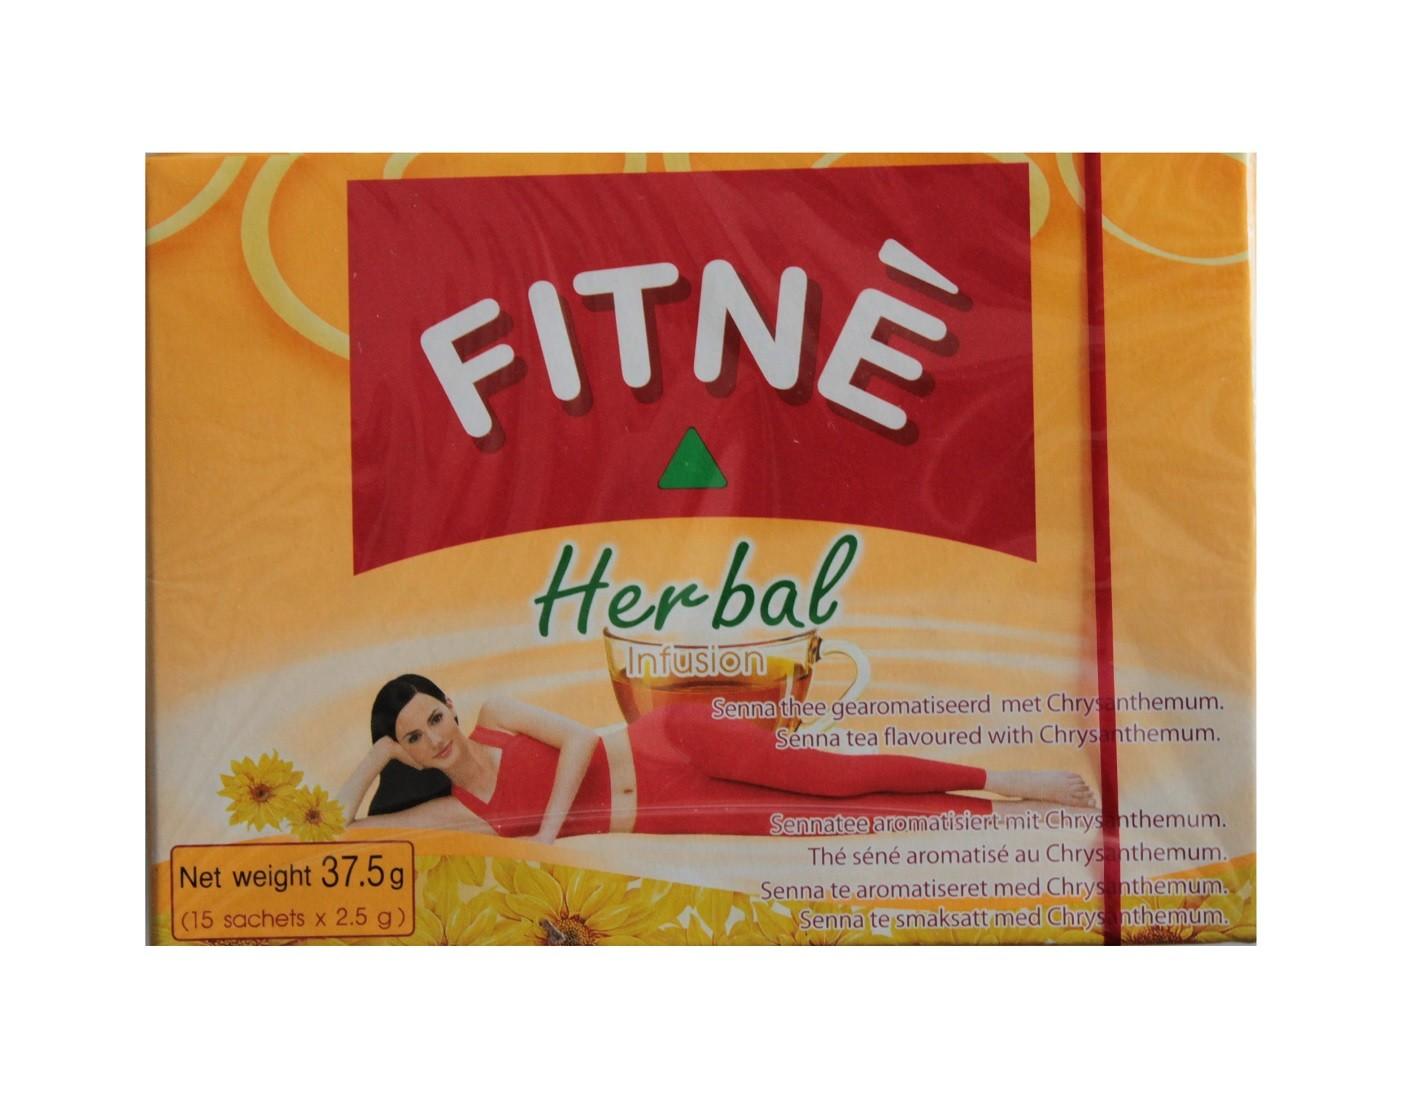 FITNE Sennakrauttee + Chrysanthemum 15 TeeBeutel gesamt 37,5g sennakraut Diät Fitness Abführtee